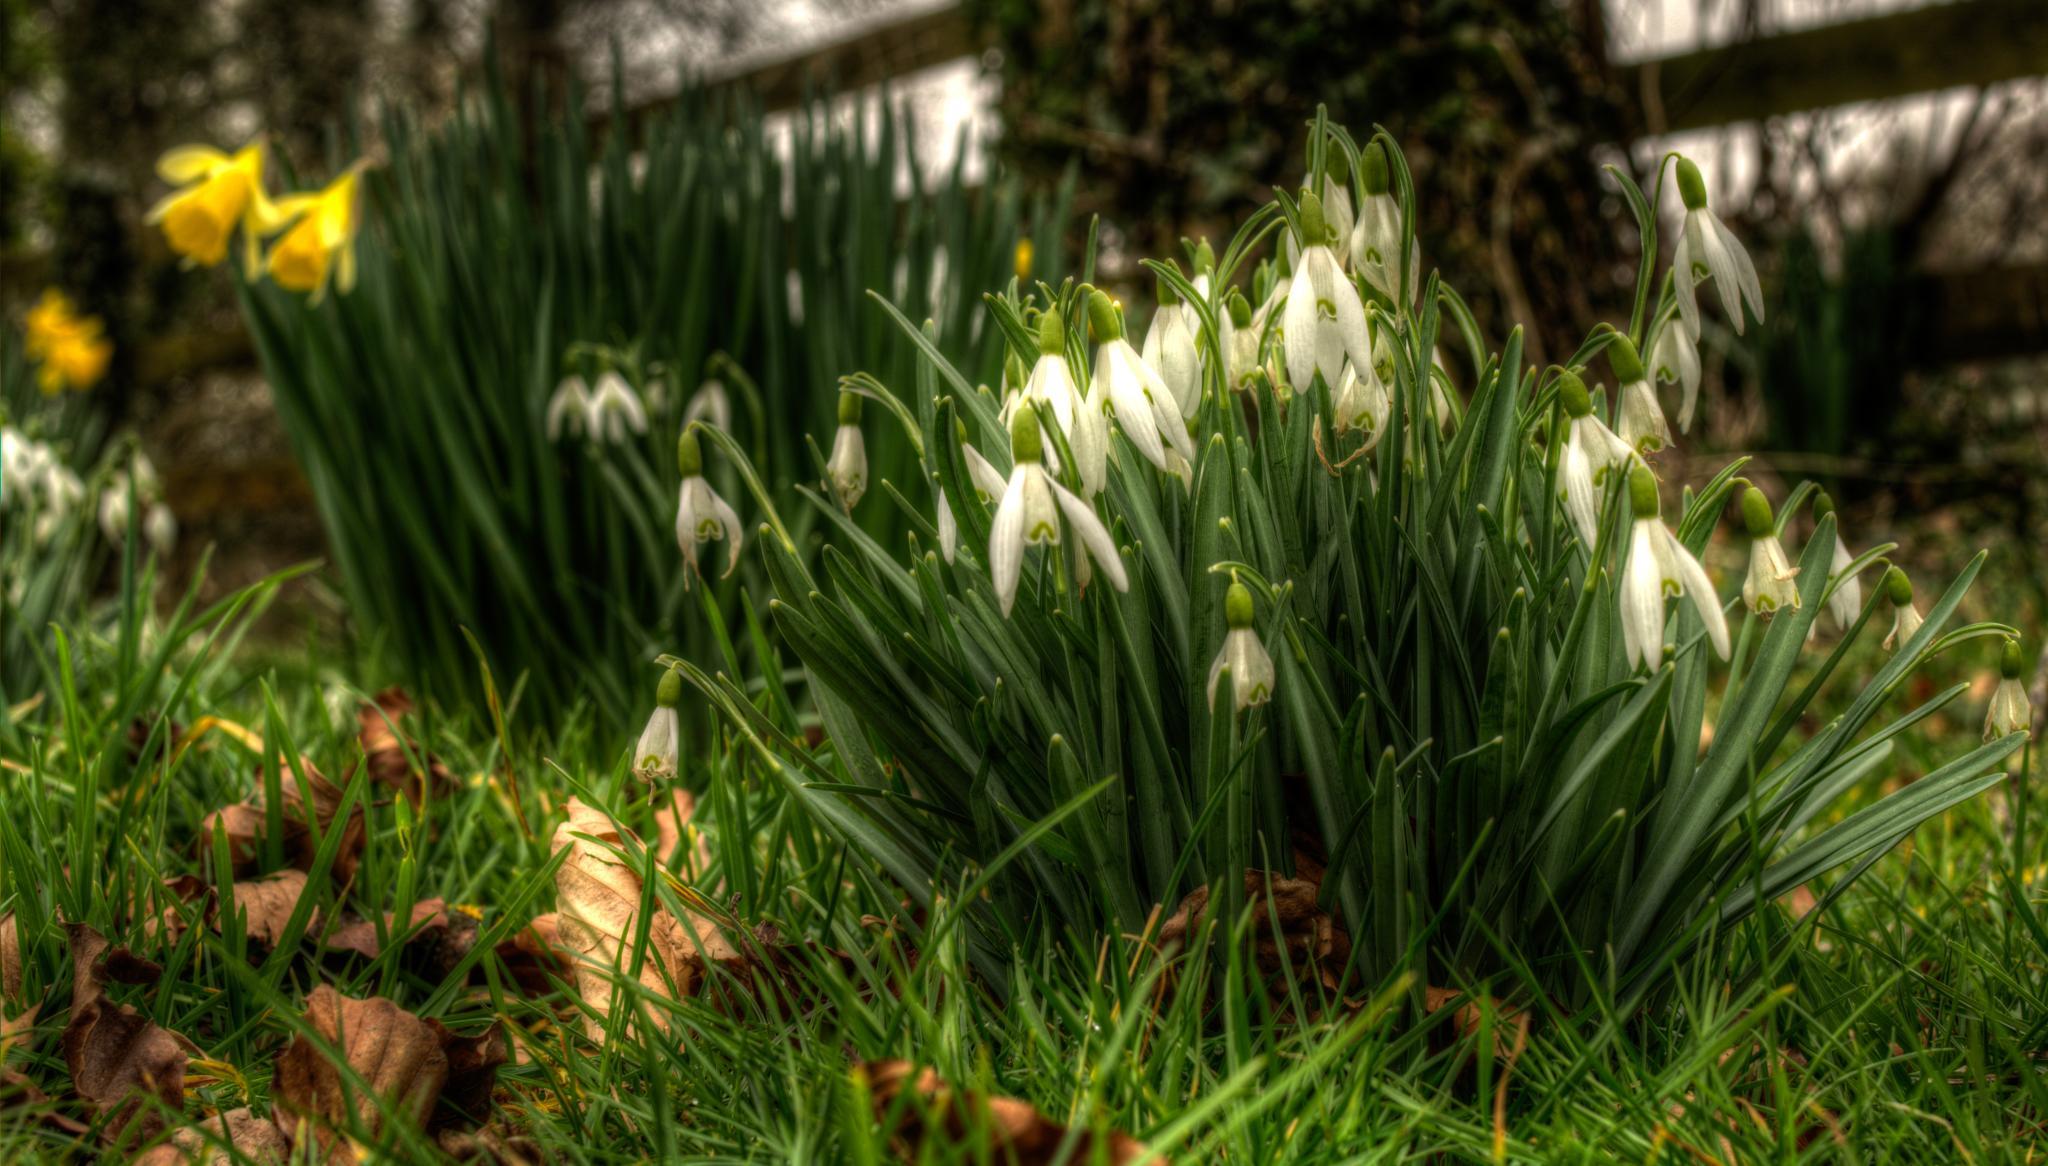 Snowdrops by mike.lloyd.125